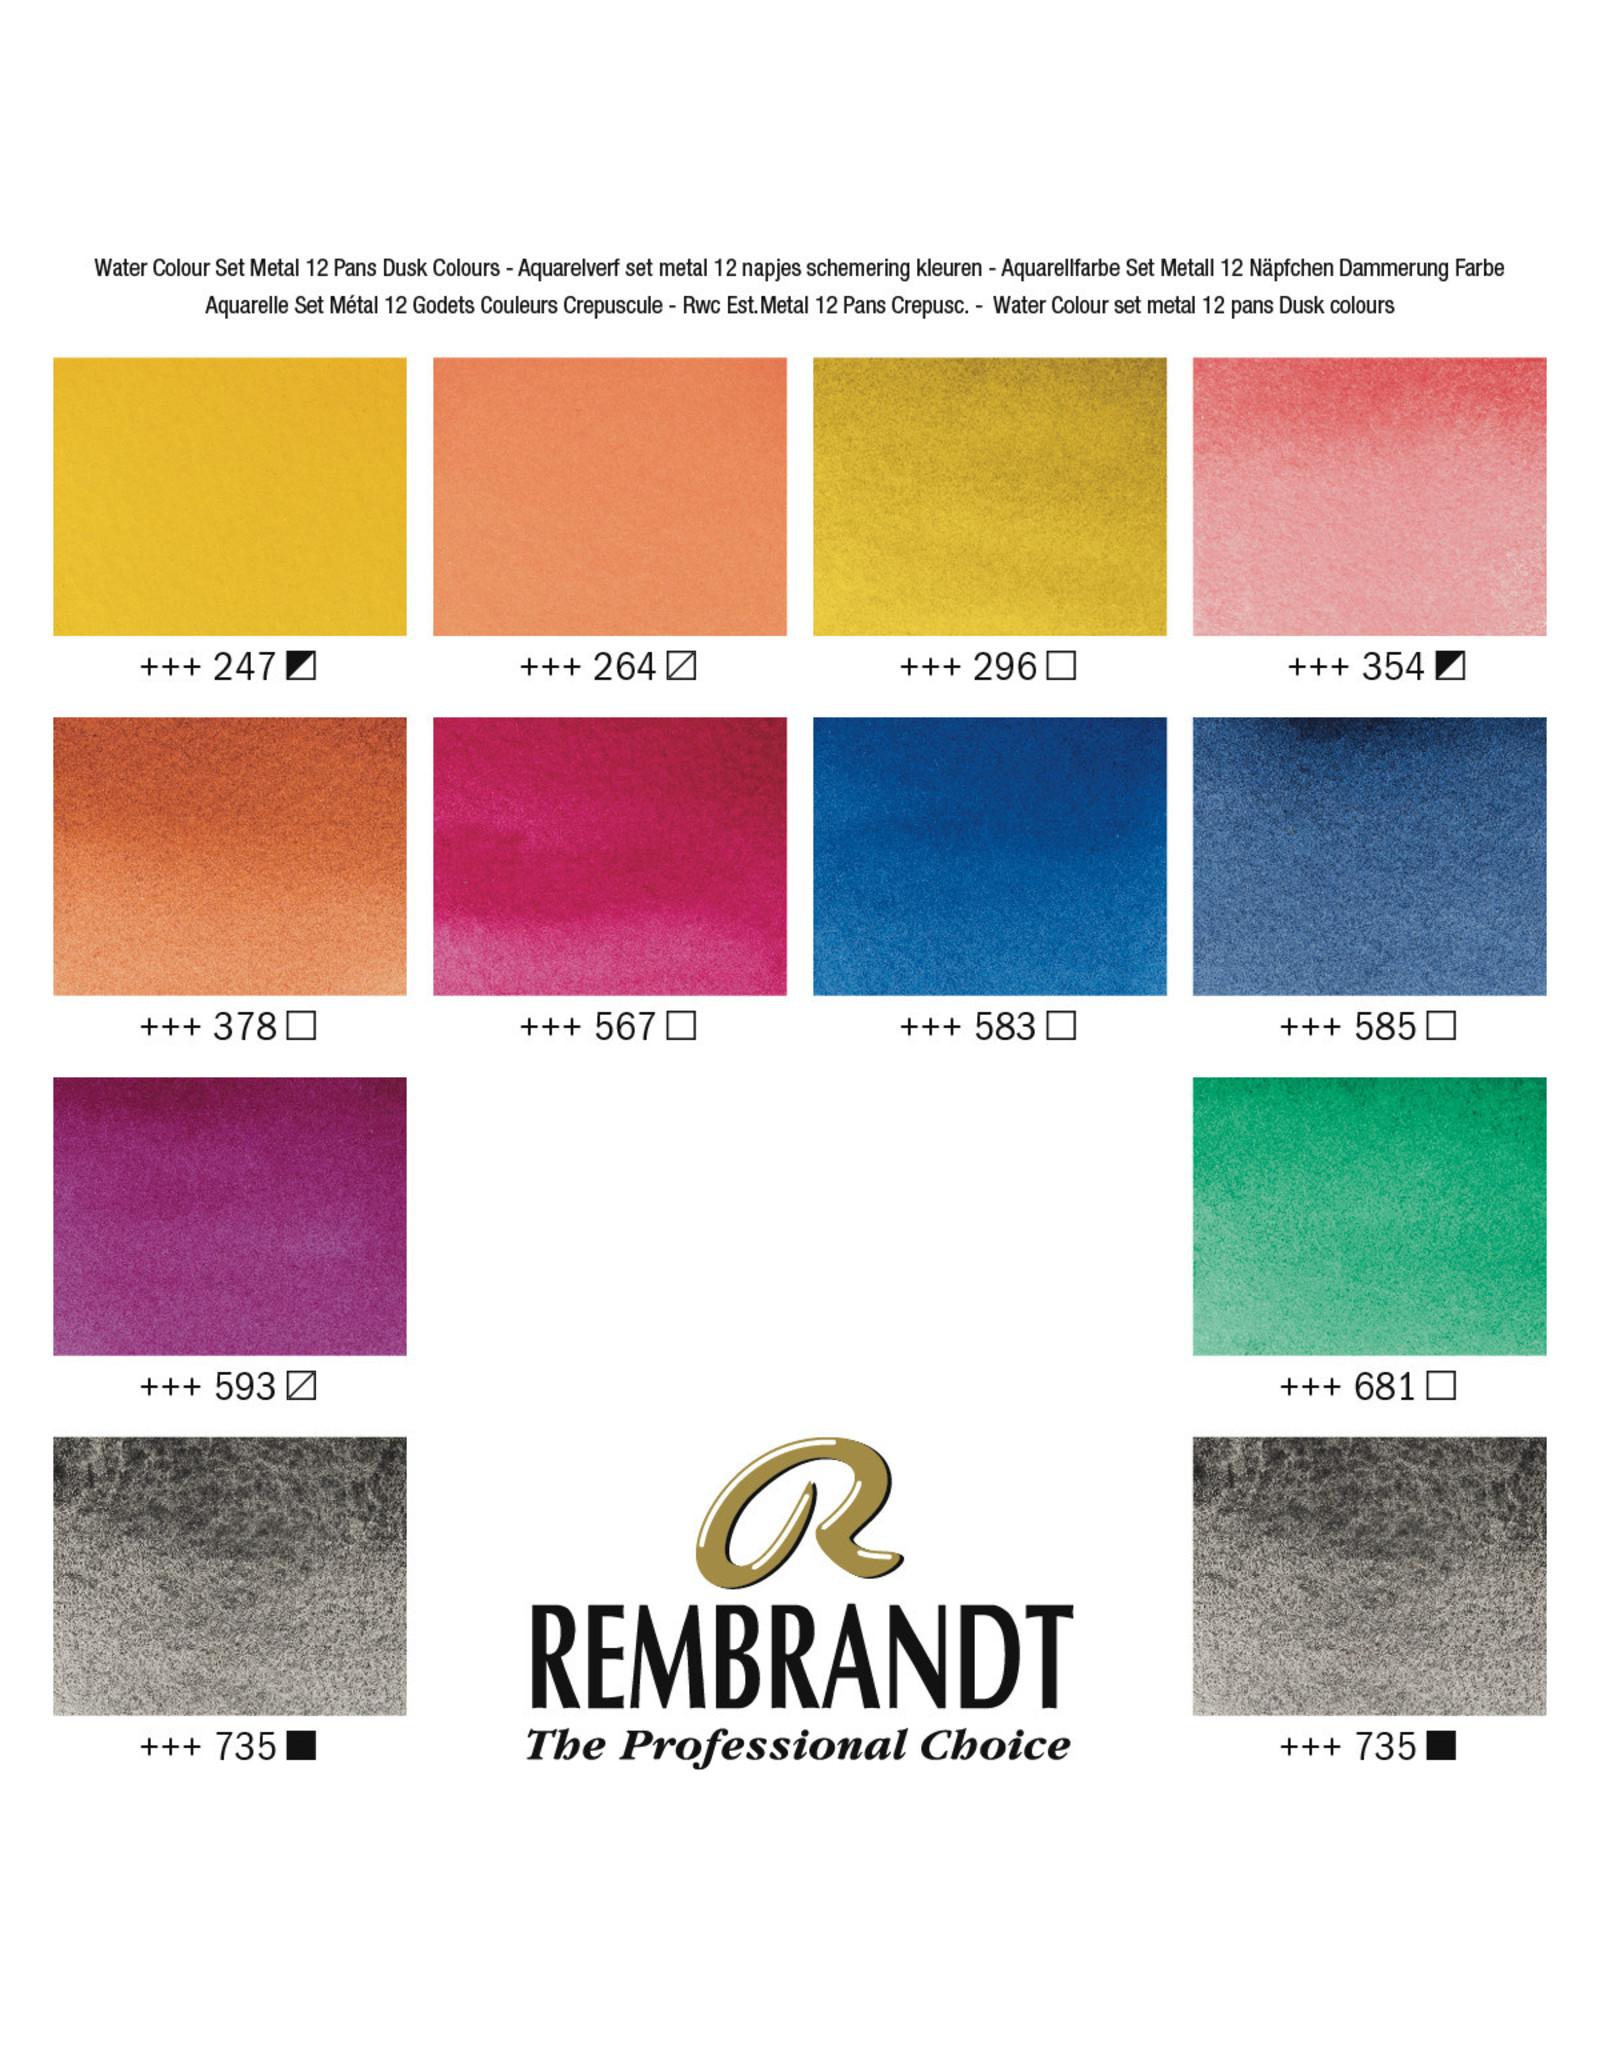 Rembrandt Oxidezwart & mengkleuren